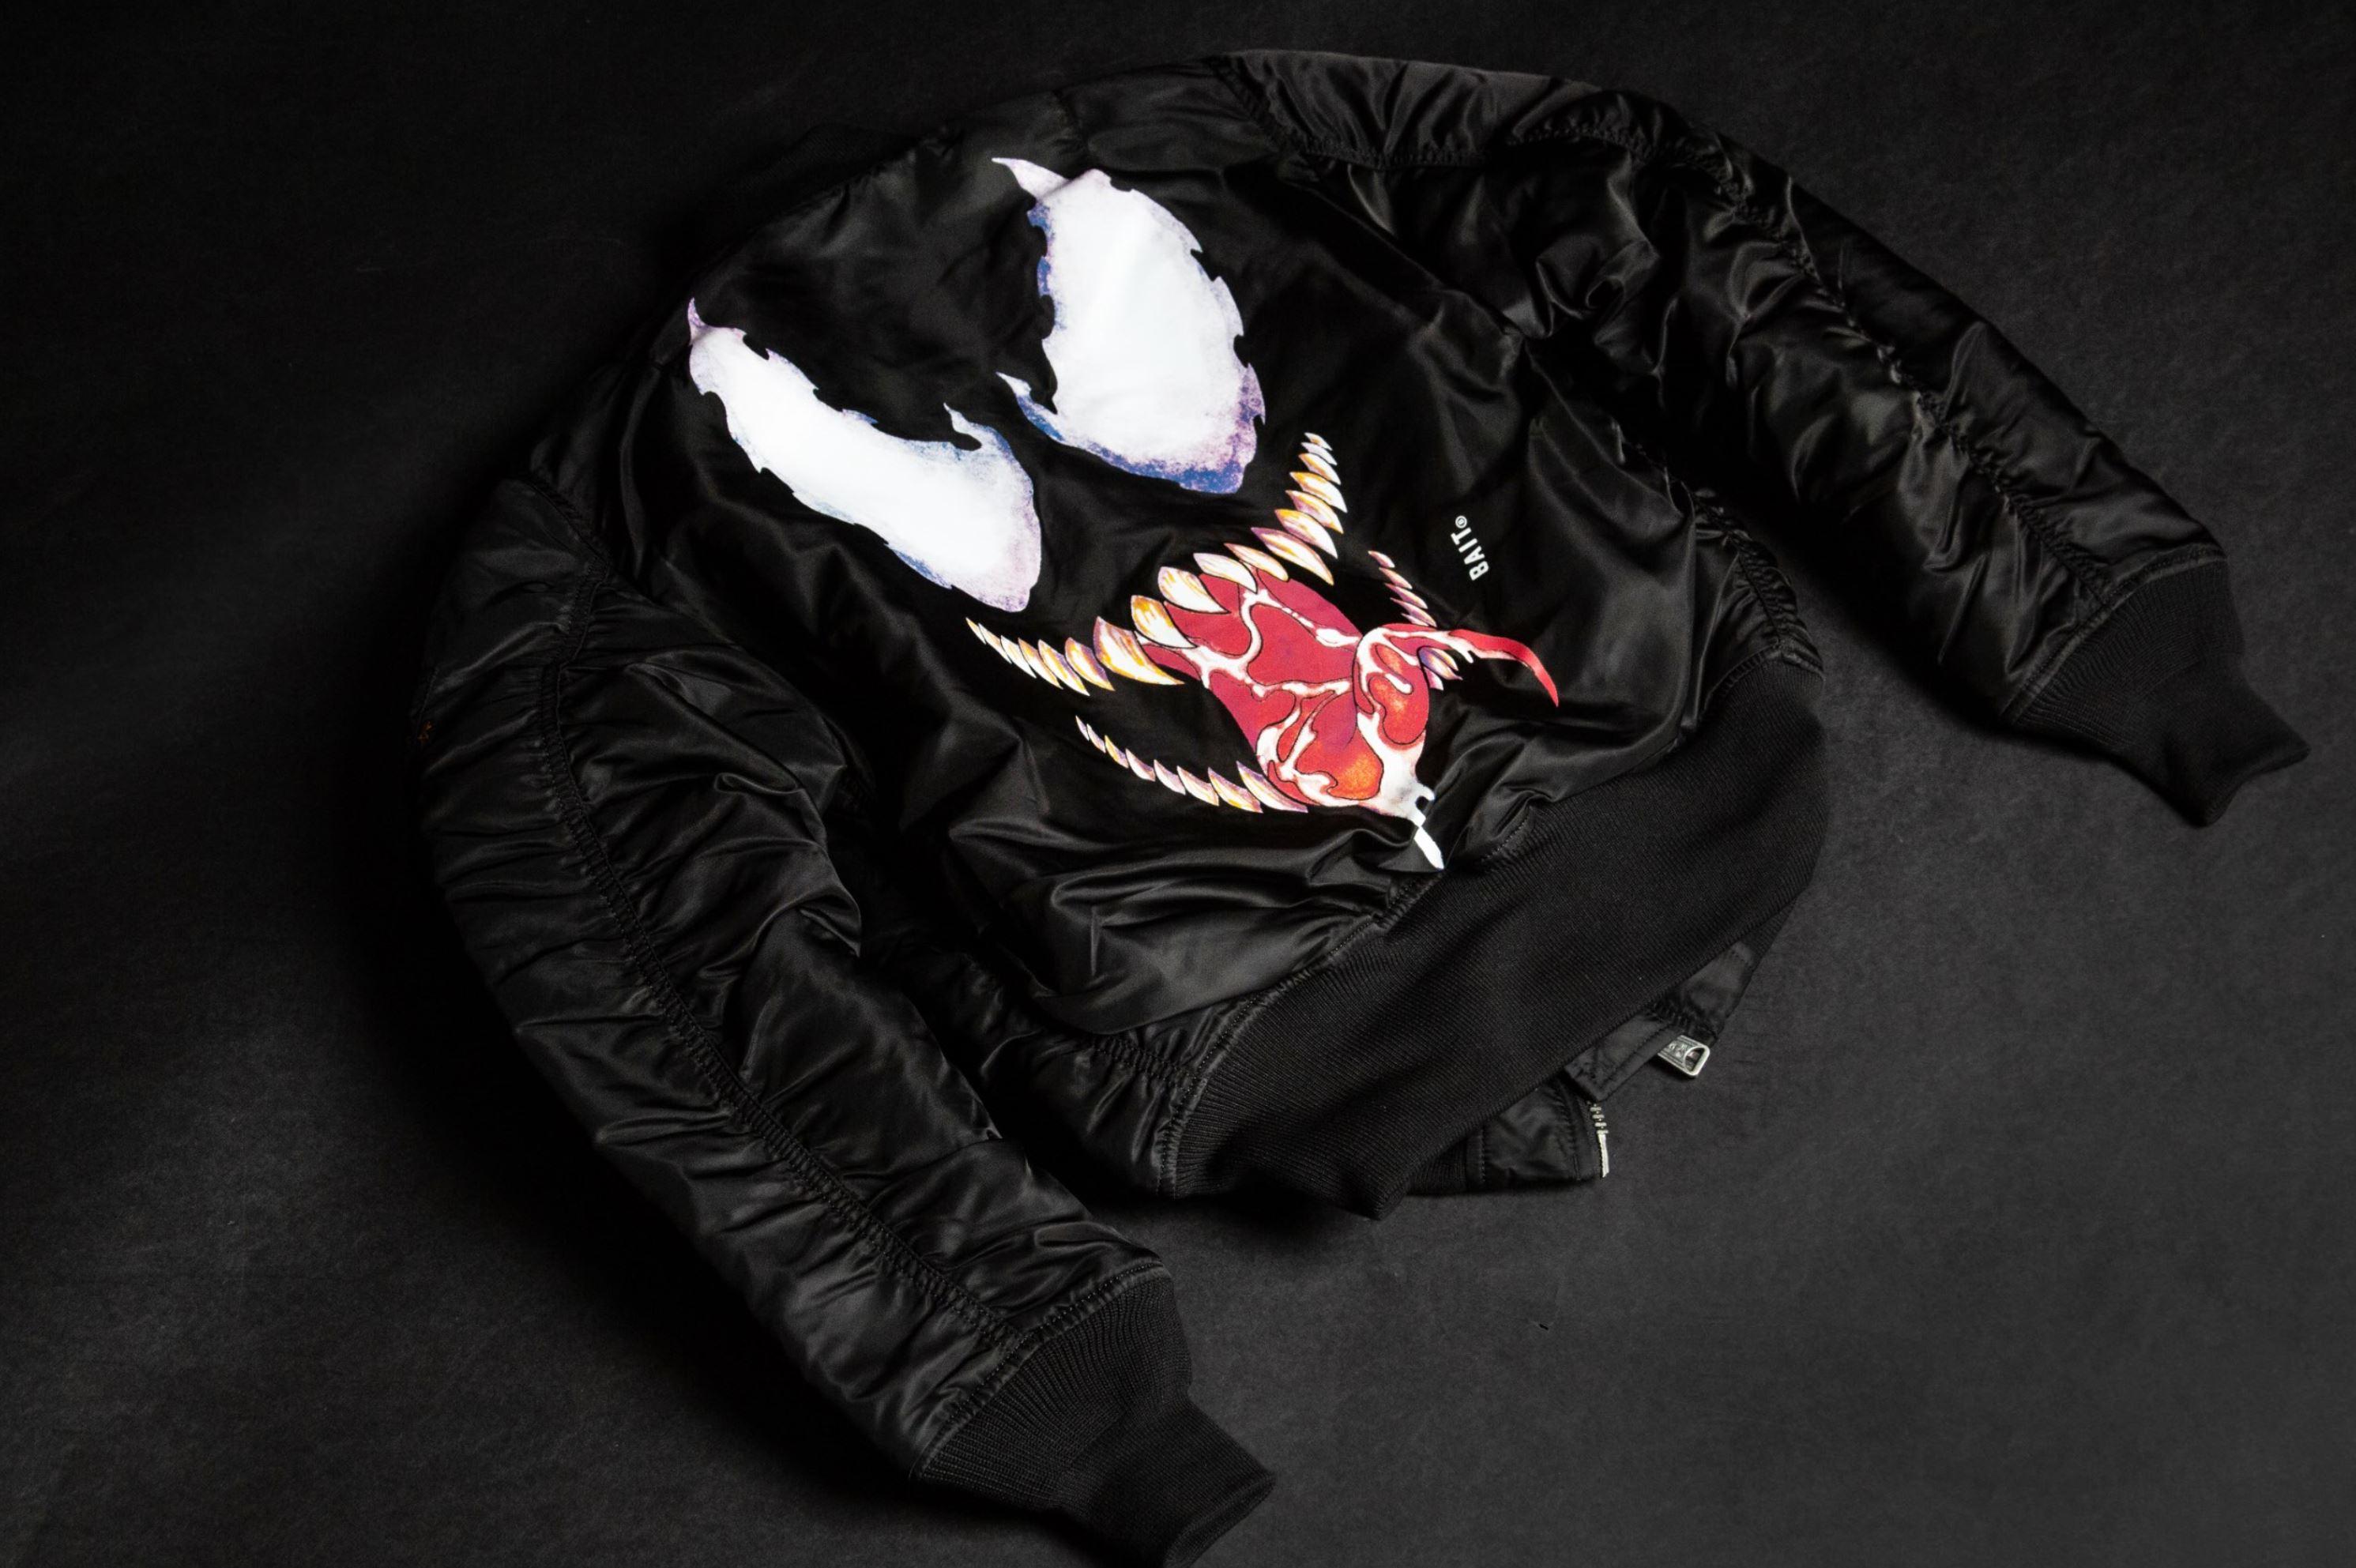 venom jacket bait alpha industries NYCC